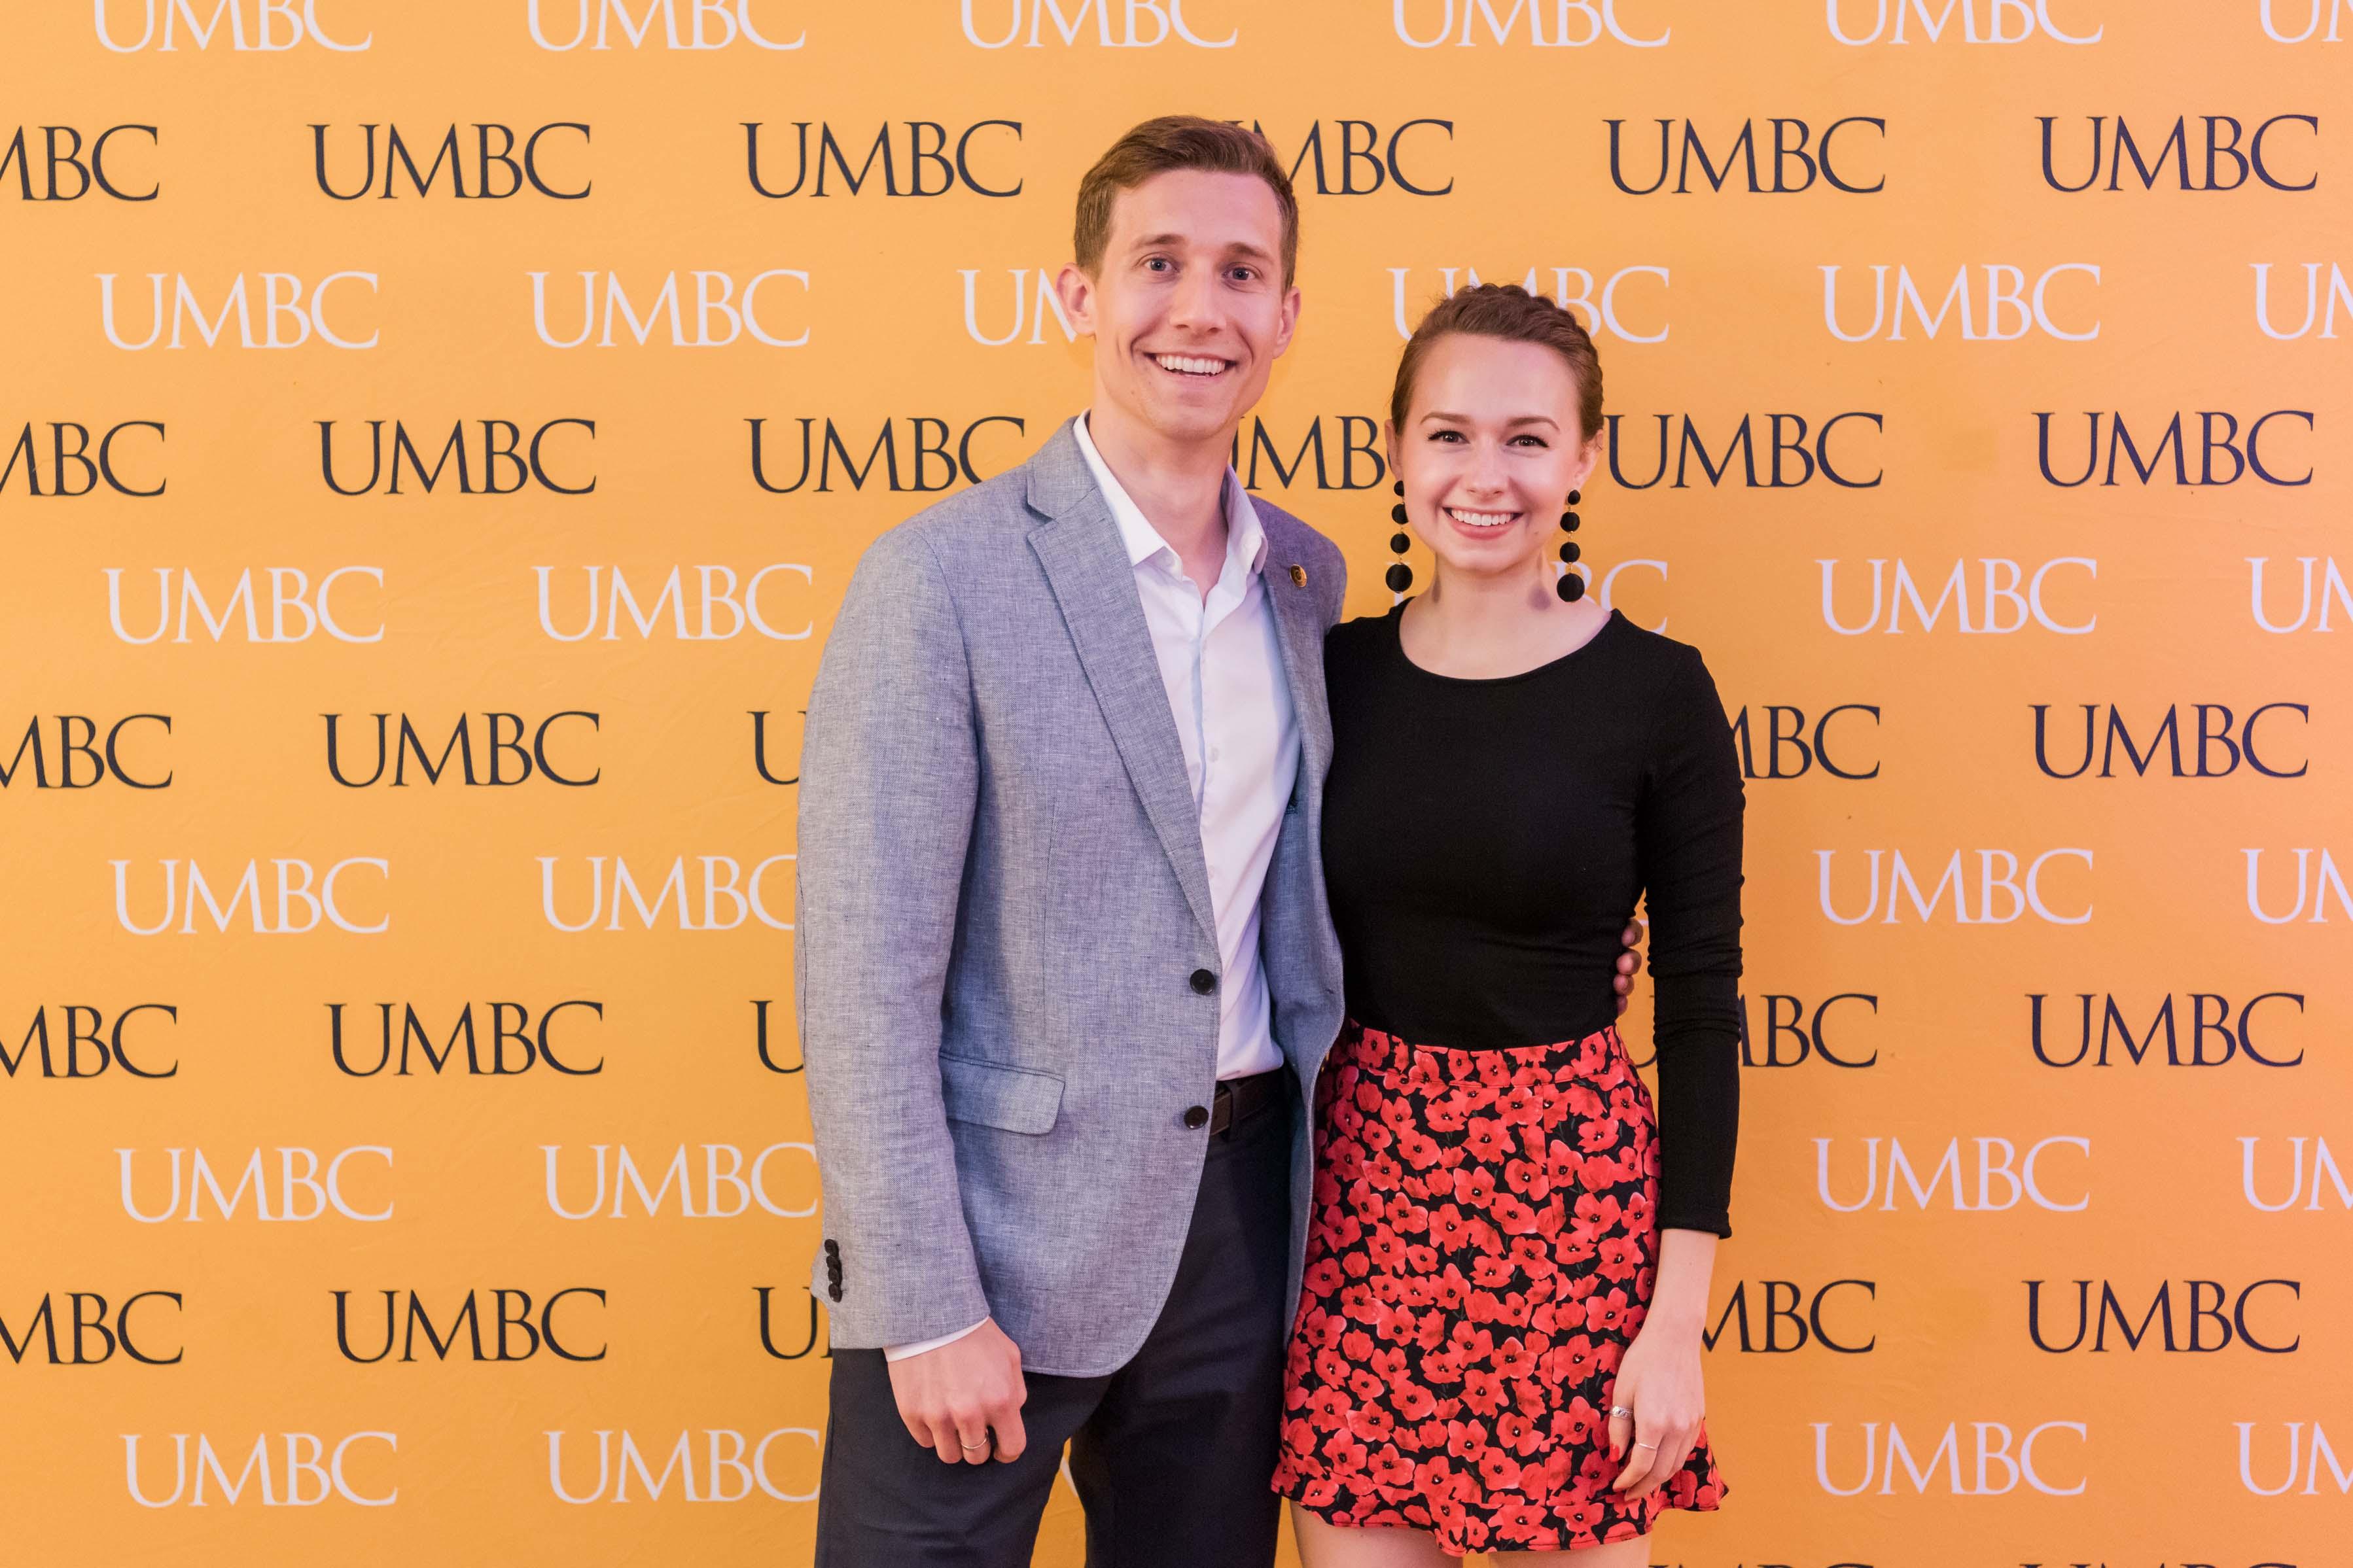 Couple pose for UMBC wine tasting